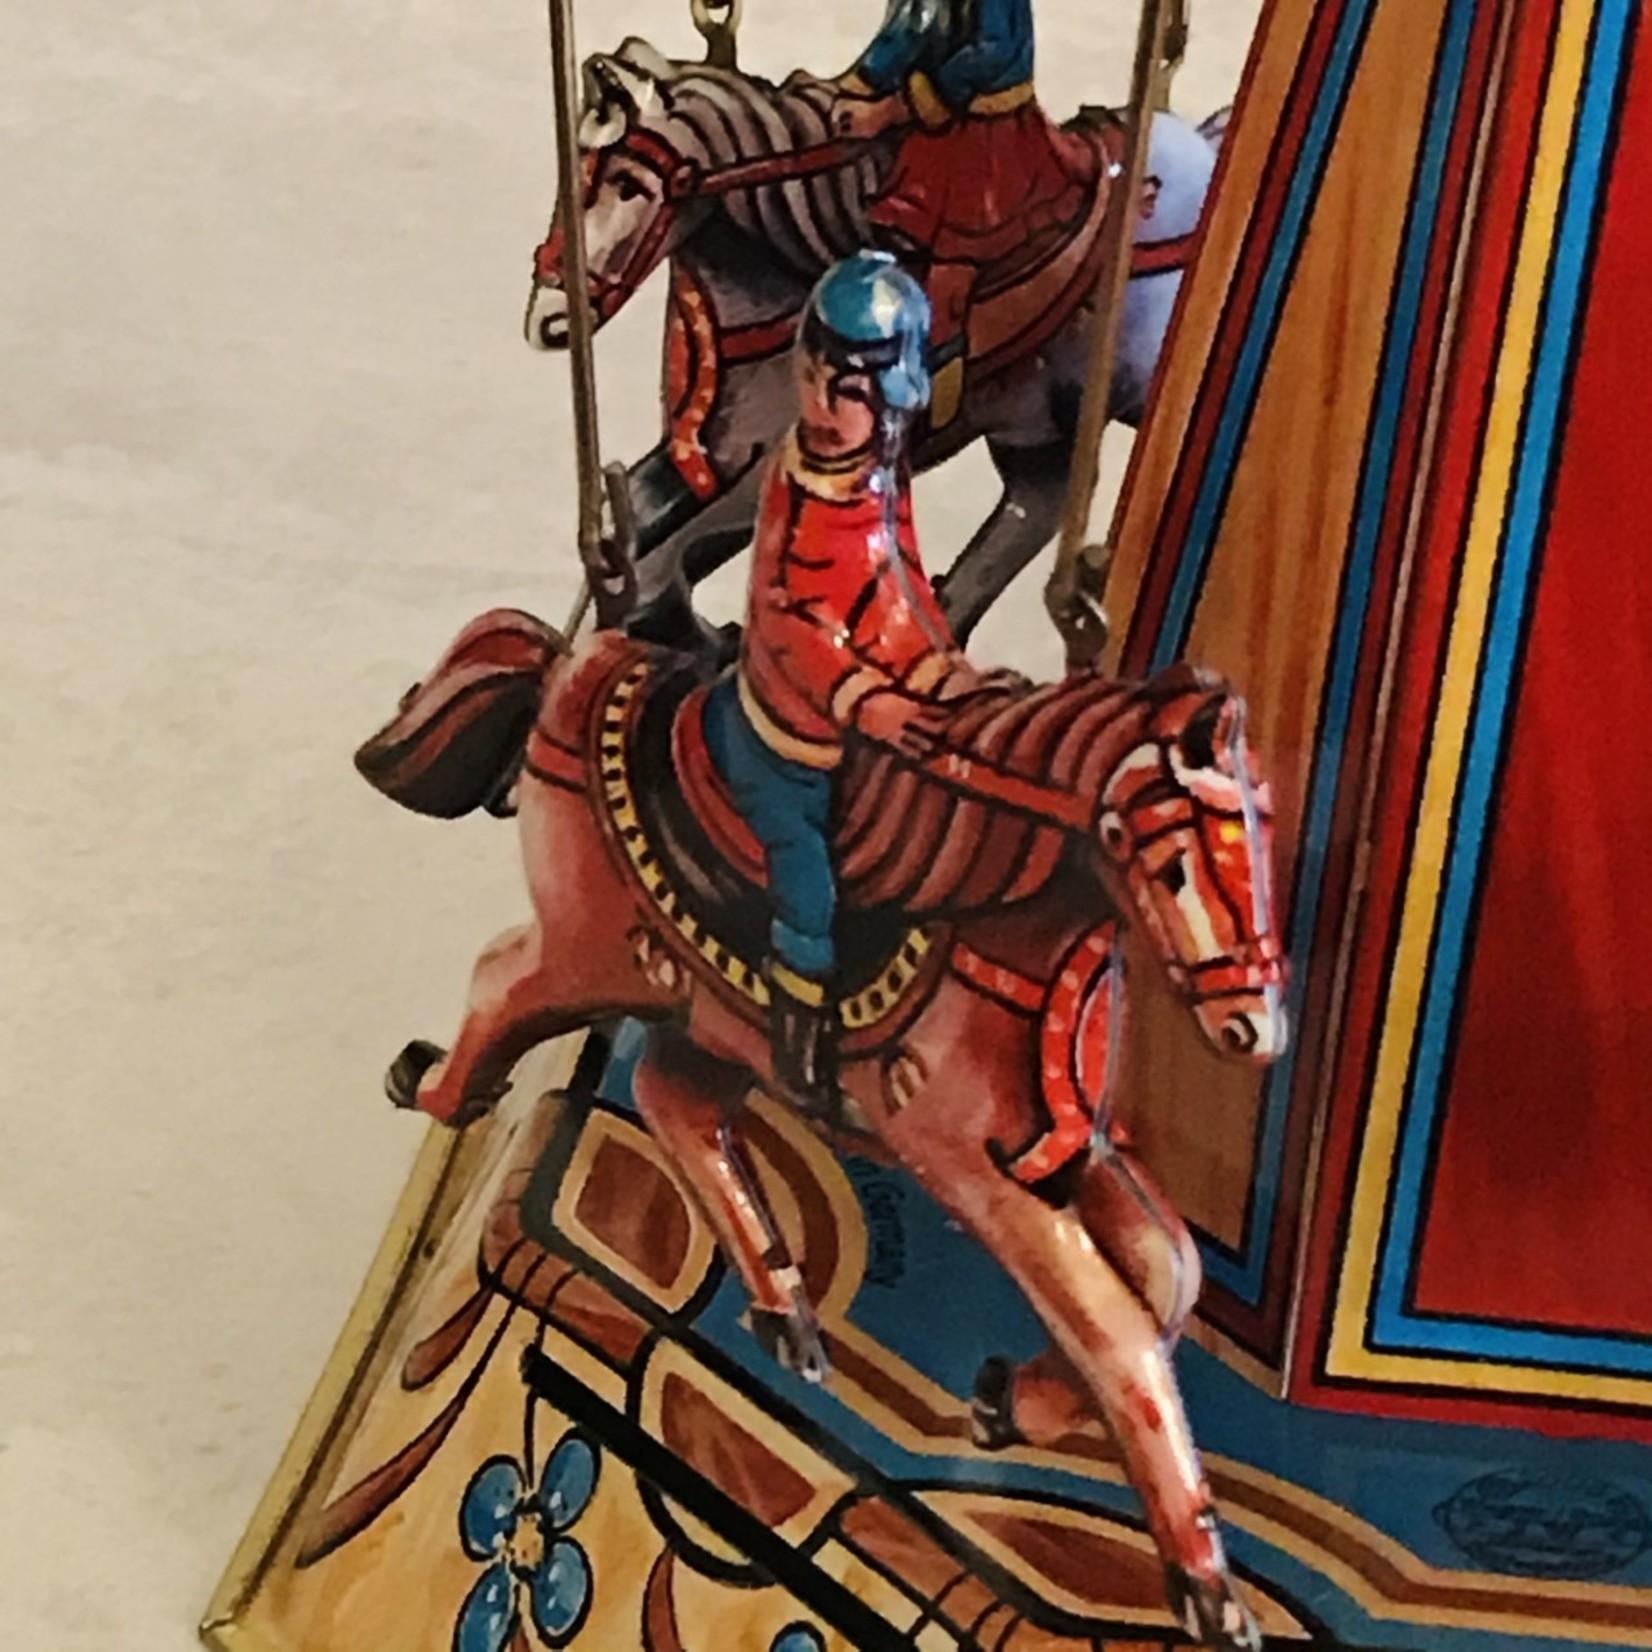 Blechfabrik Blechfabrik Royal Equestrian Carousel